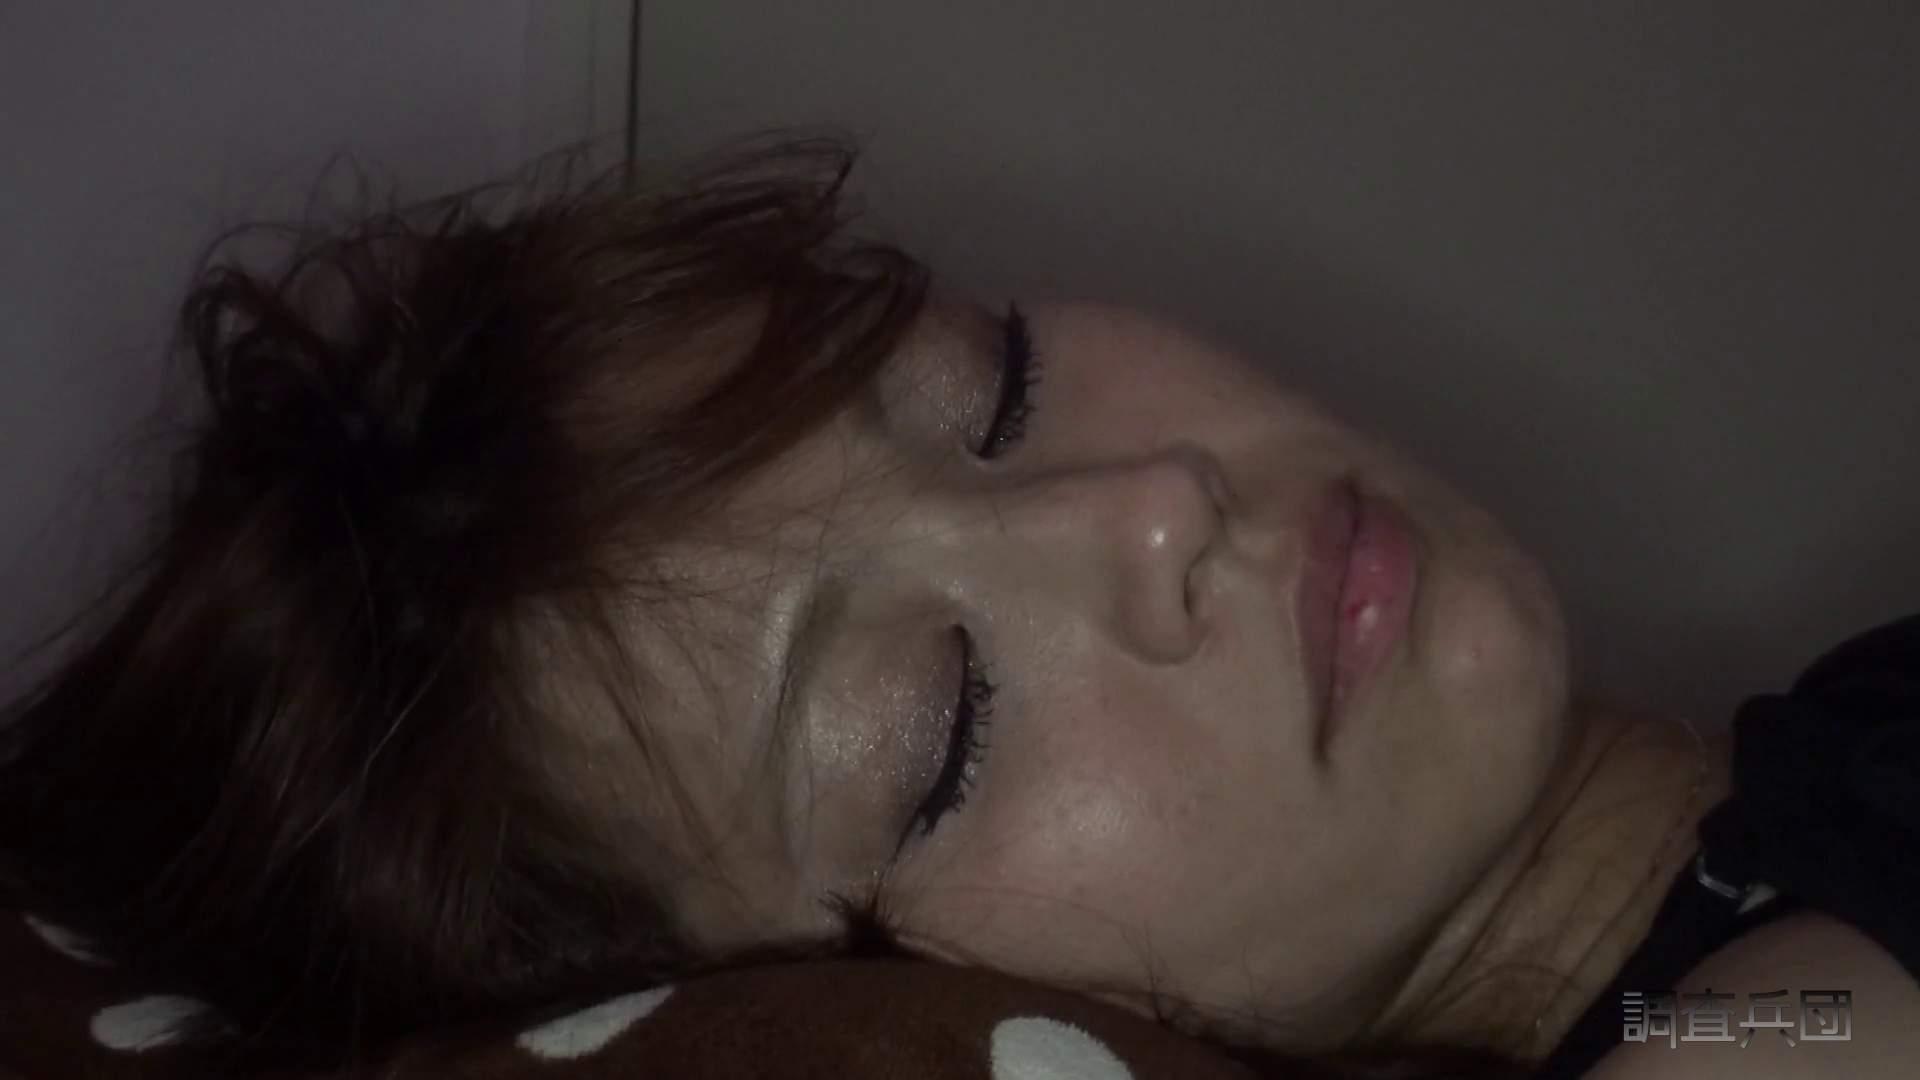 RE:~反撃の悪戯~vol.19 エステティシャン美人若ママ・かなえ【前編】 美人 エロ無料画像 78PIX 50